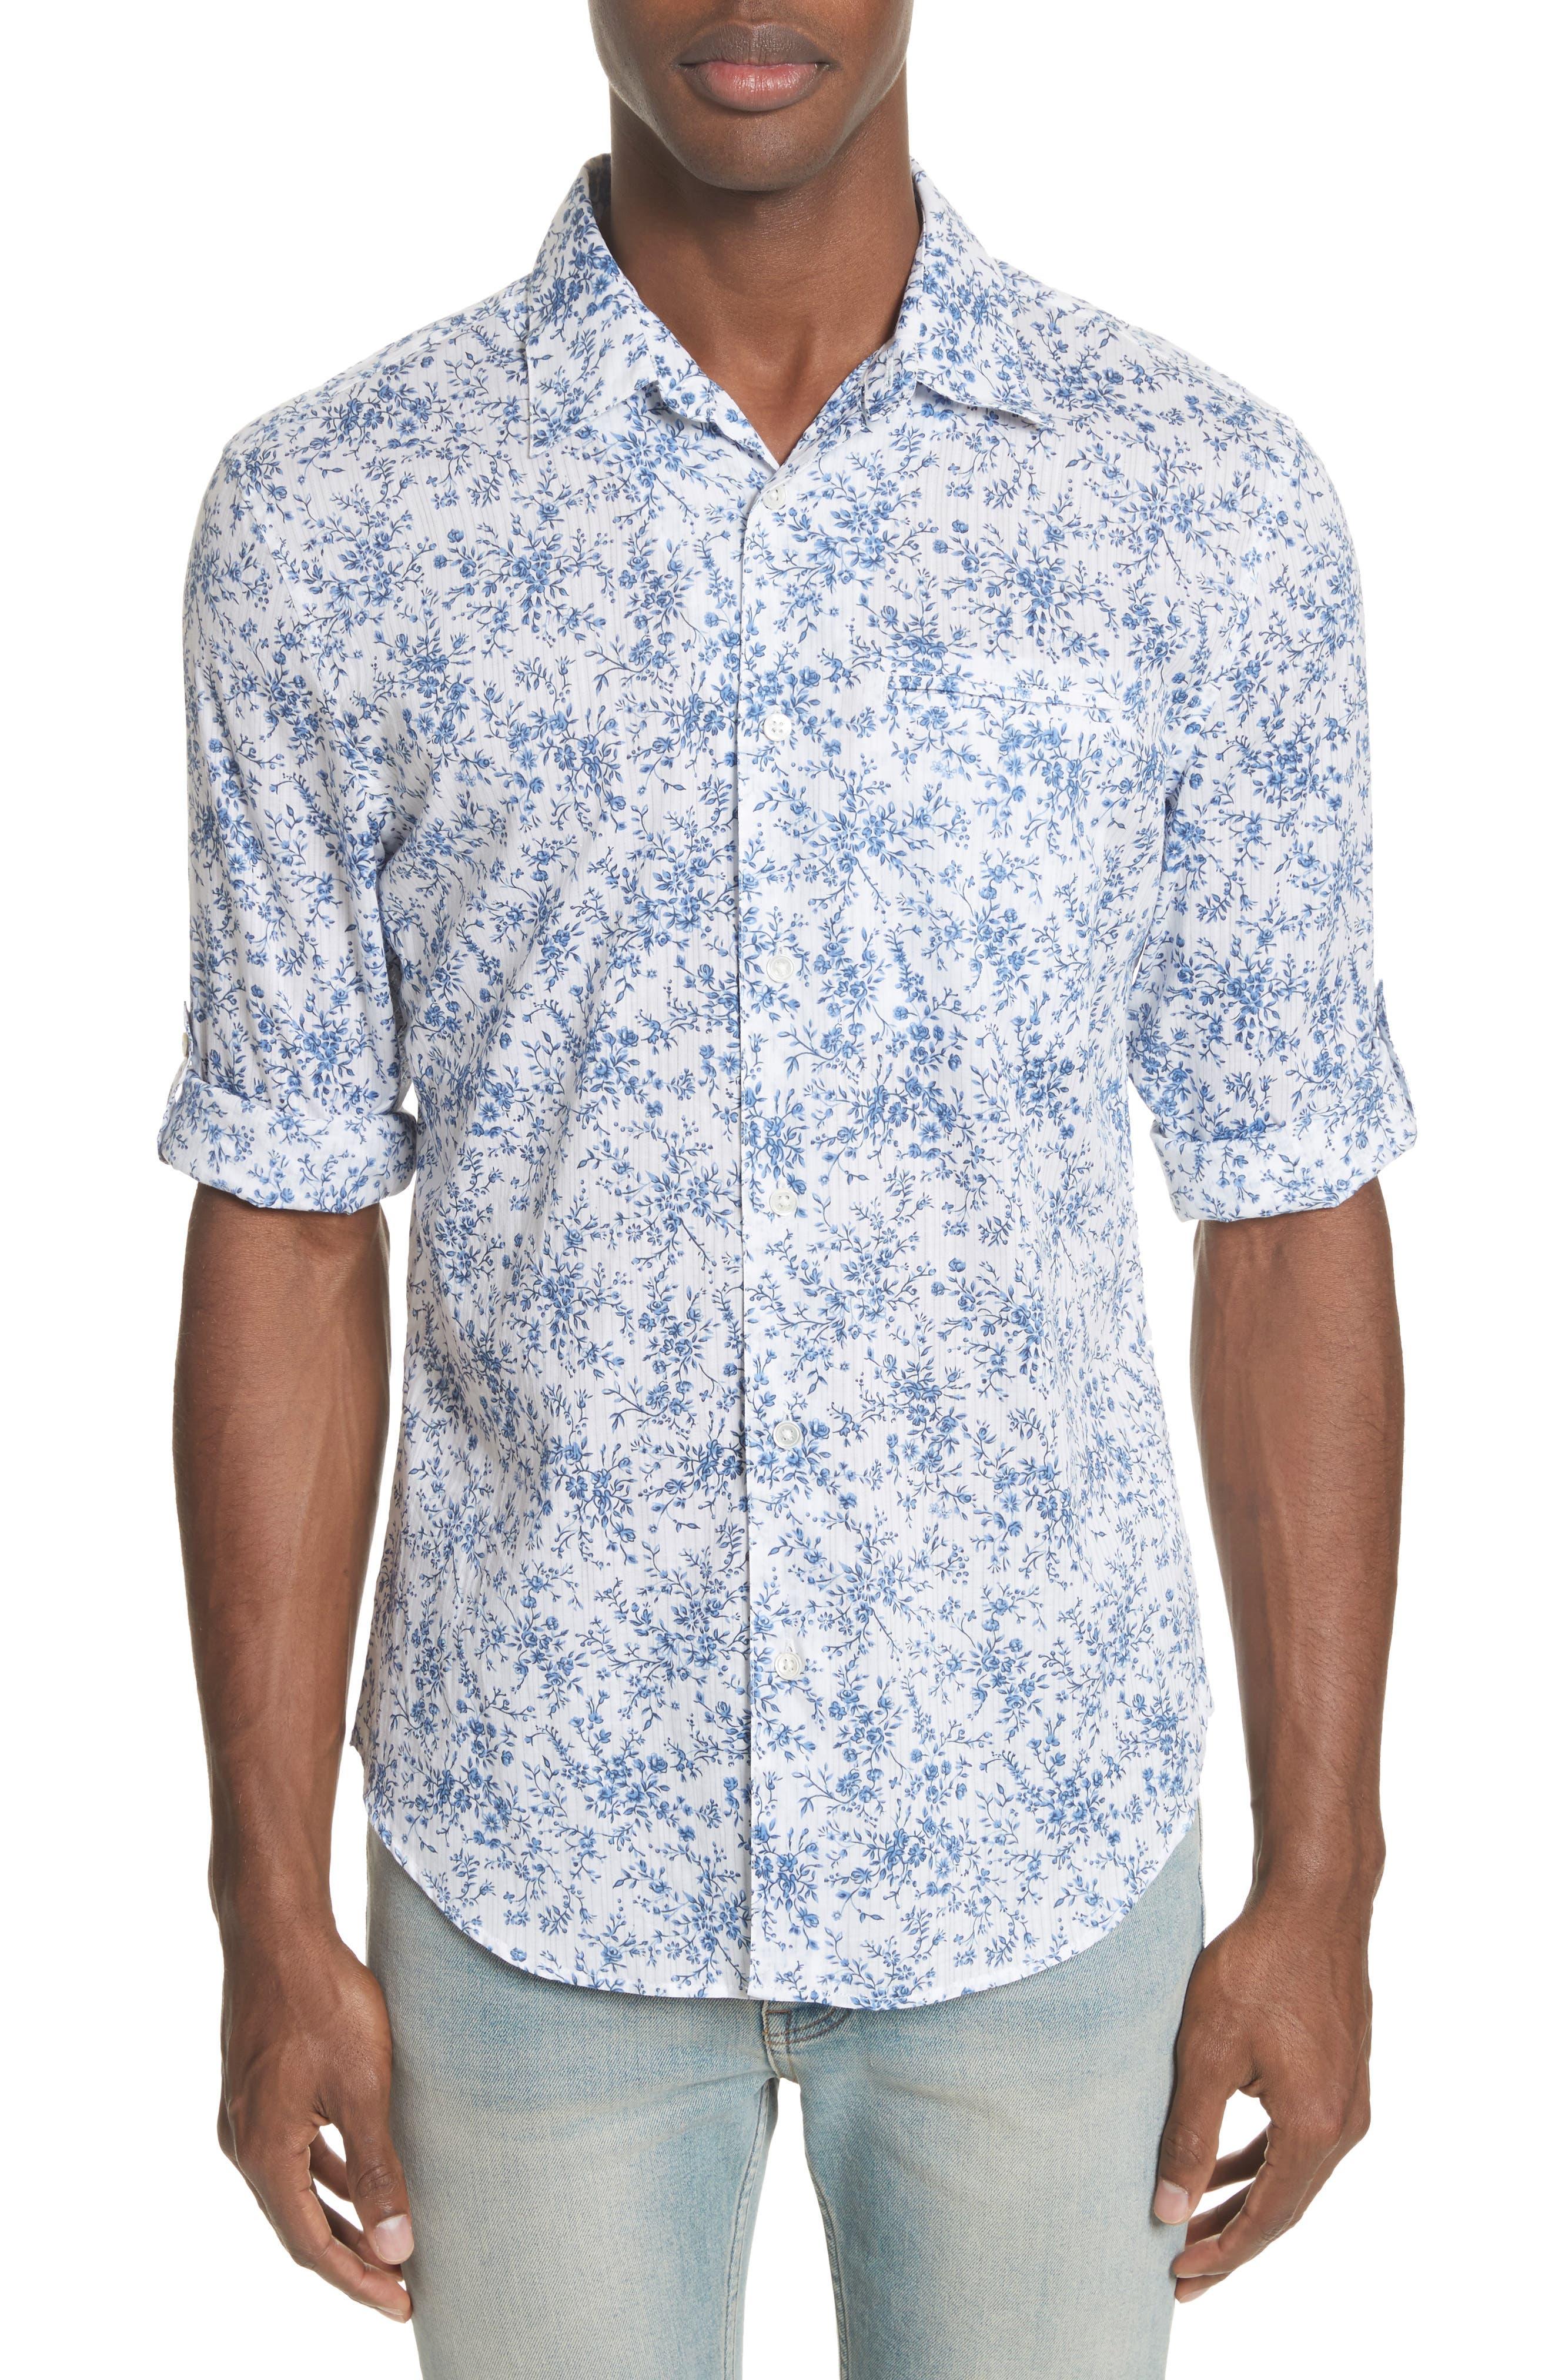 John Varvatos Slim Fit Floral Print Shirt,                             Main thumbnail 1, color,                             448